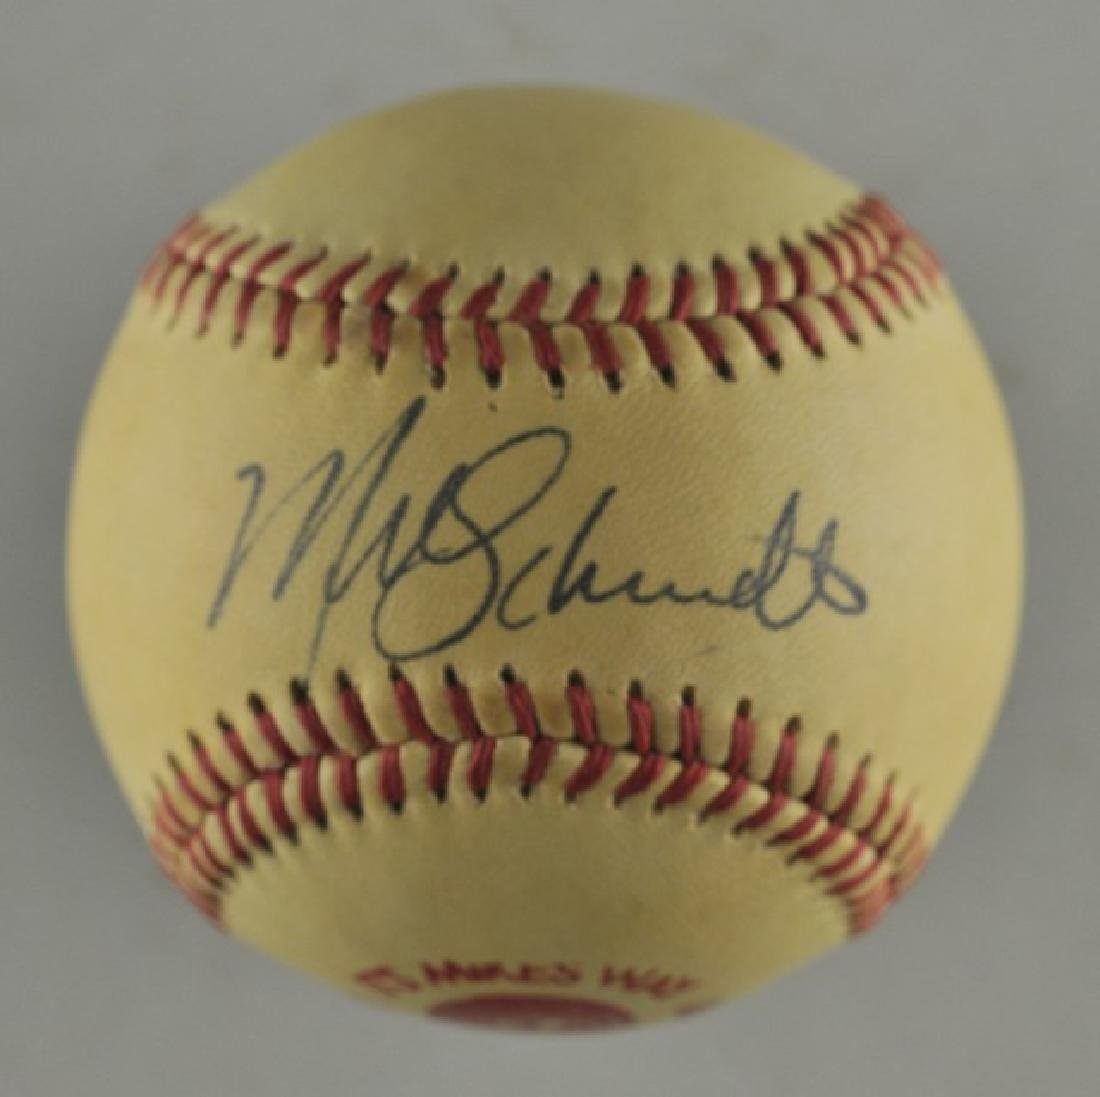 Signed Mike Schmidt Baseball